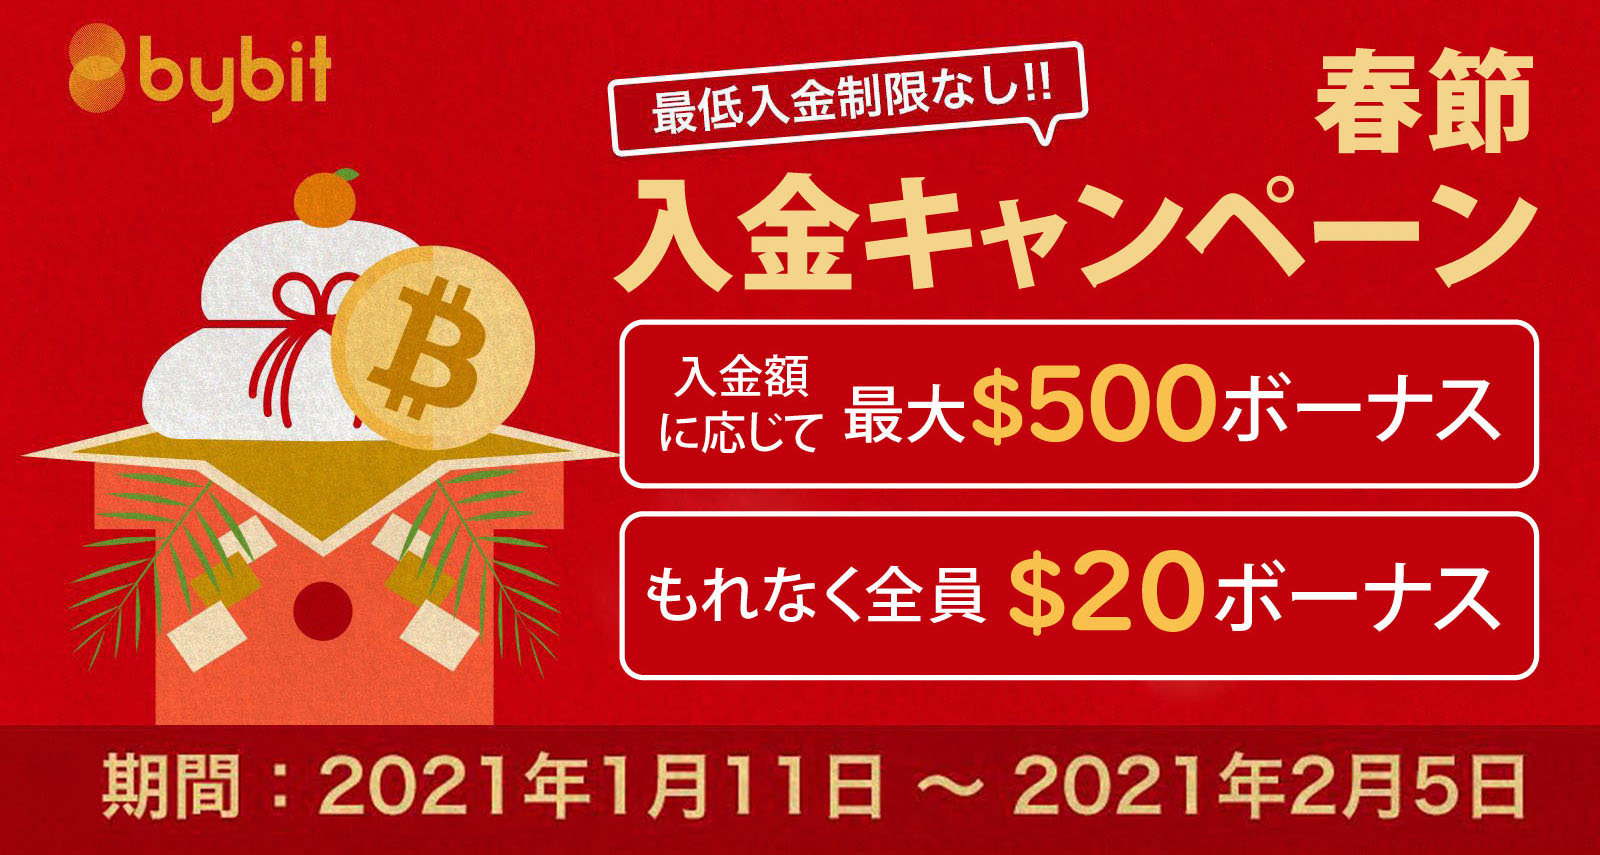 Bybit 入金キャンペーン